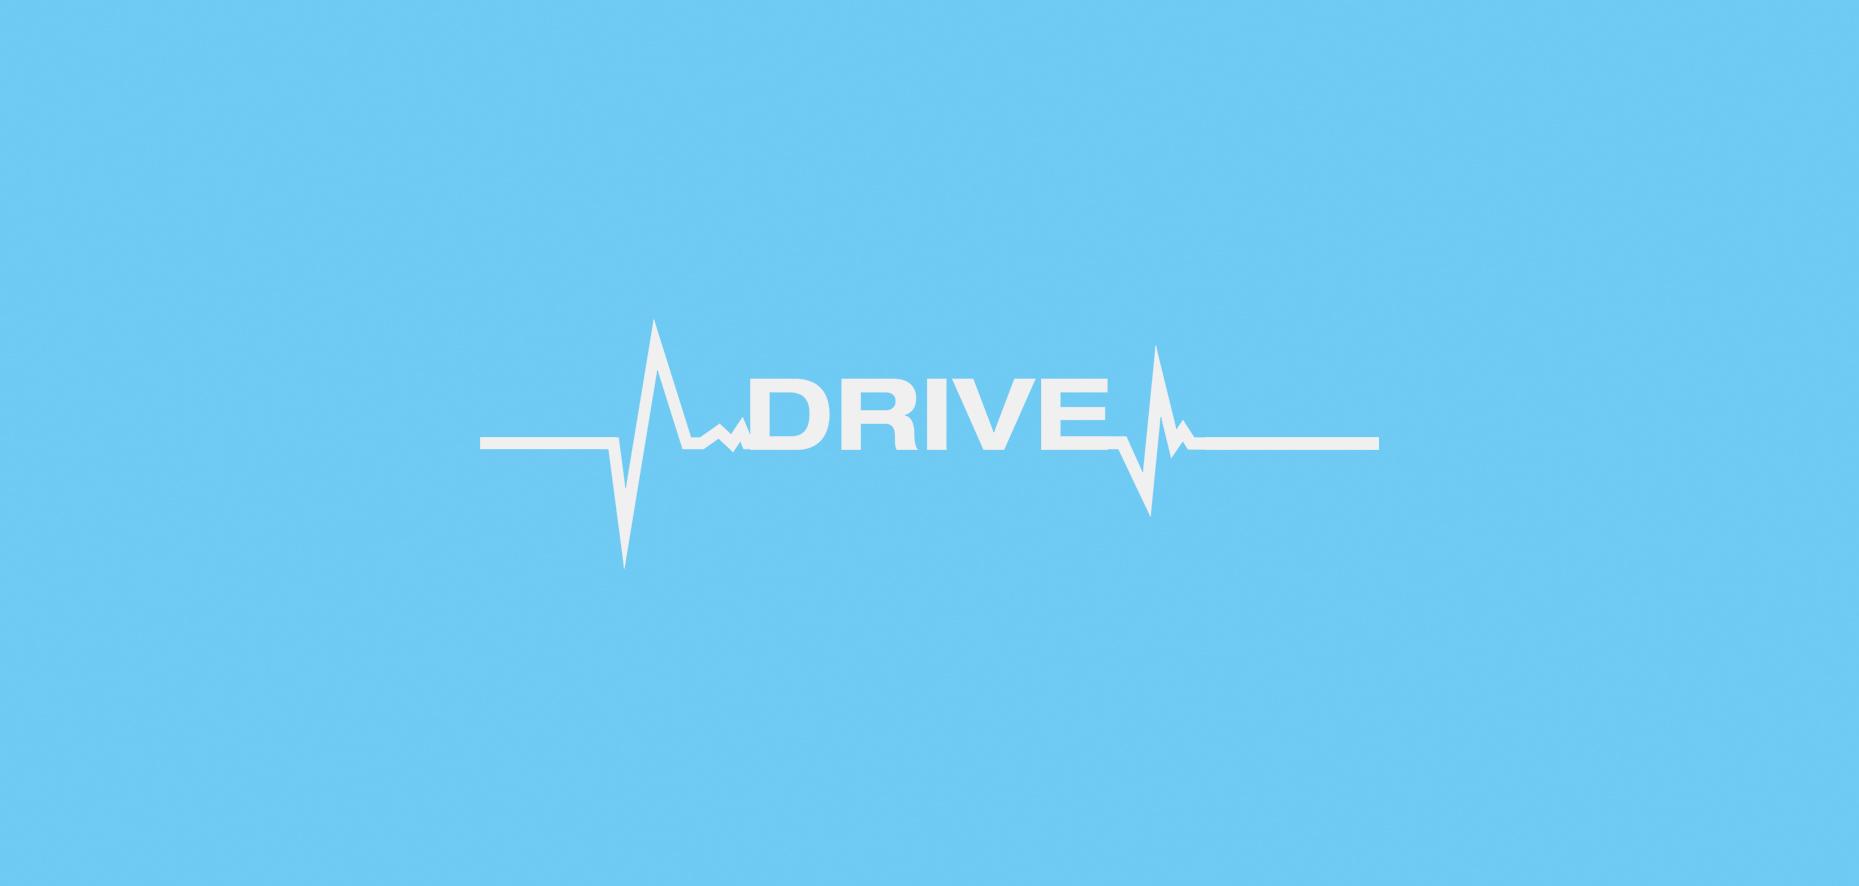 Drive Adherence App